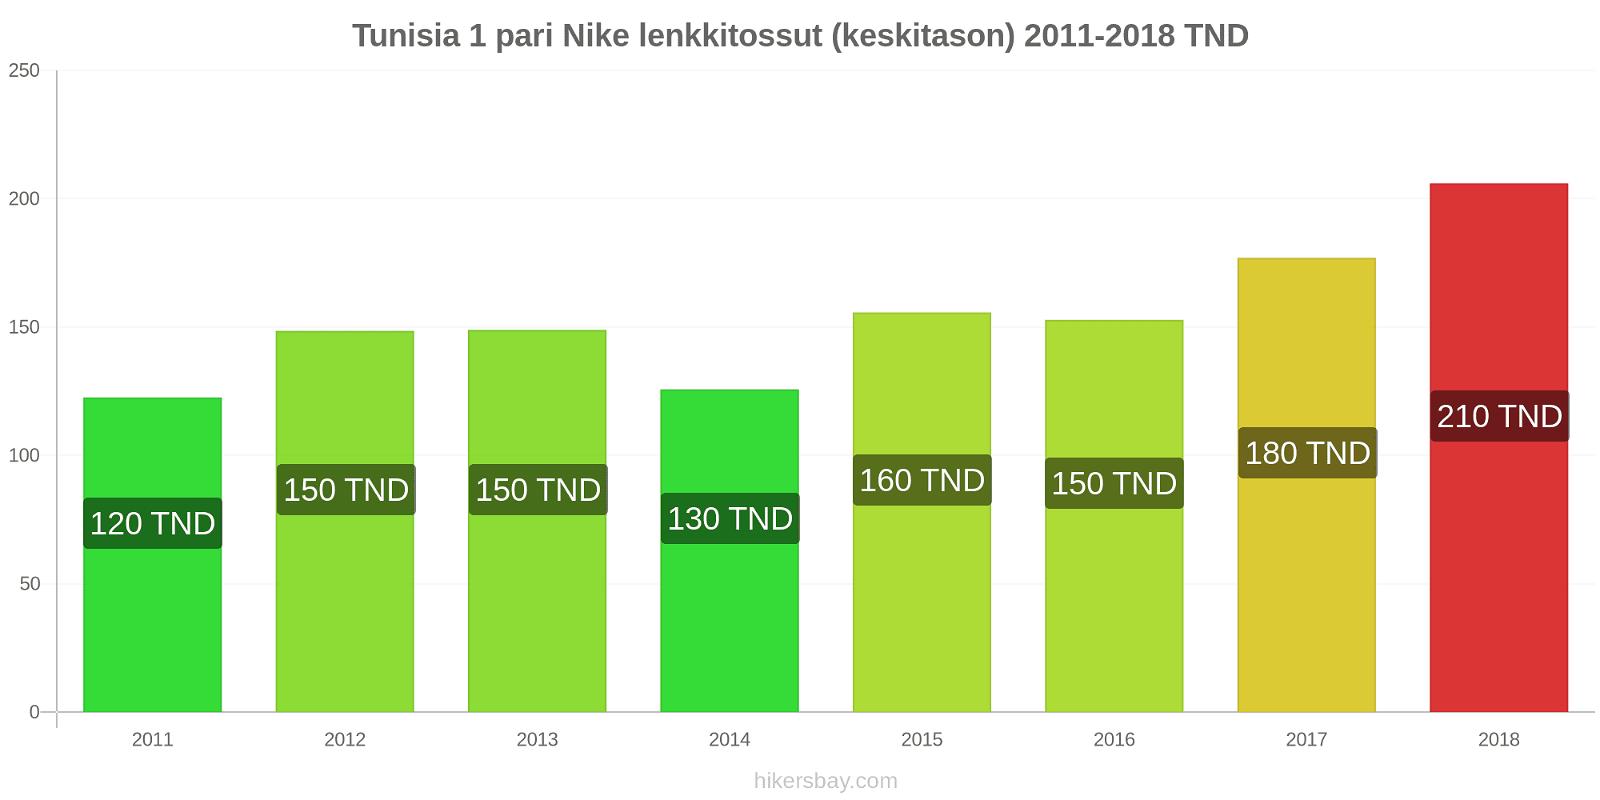 Tunisia hintojen muutokset 1 pari Nike lenkkitossut (keskitason) hikersbay.com